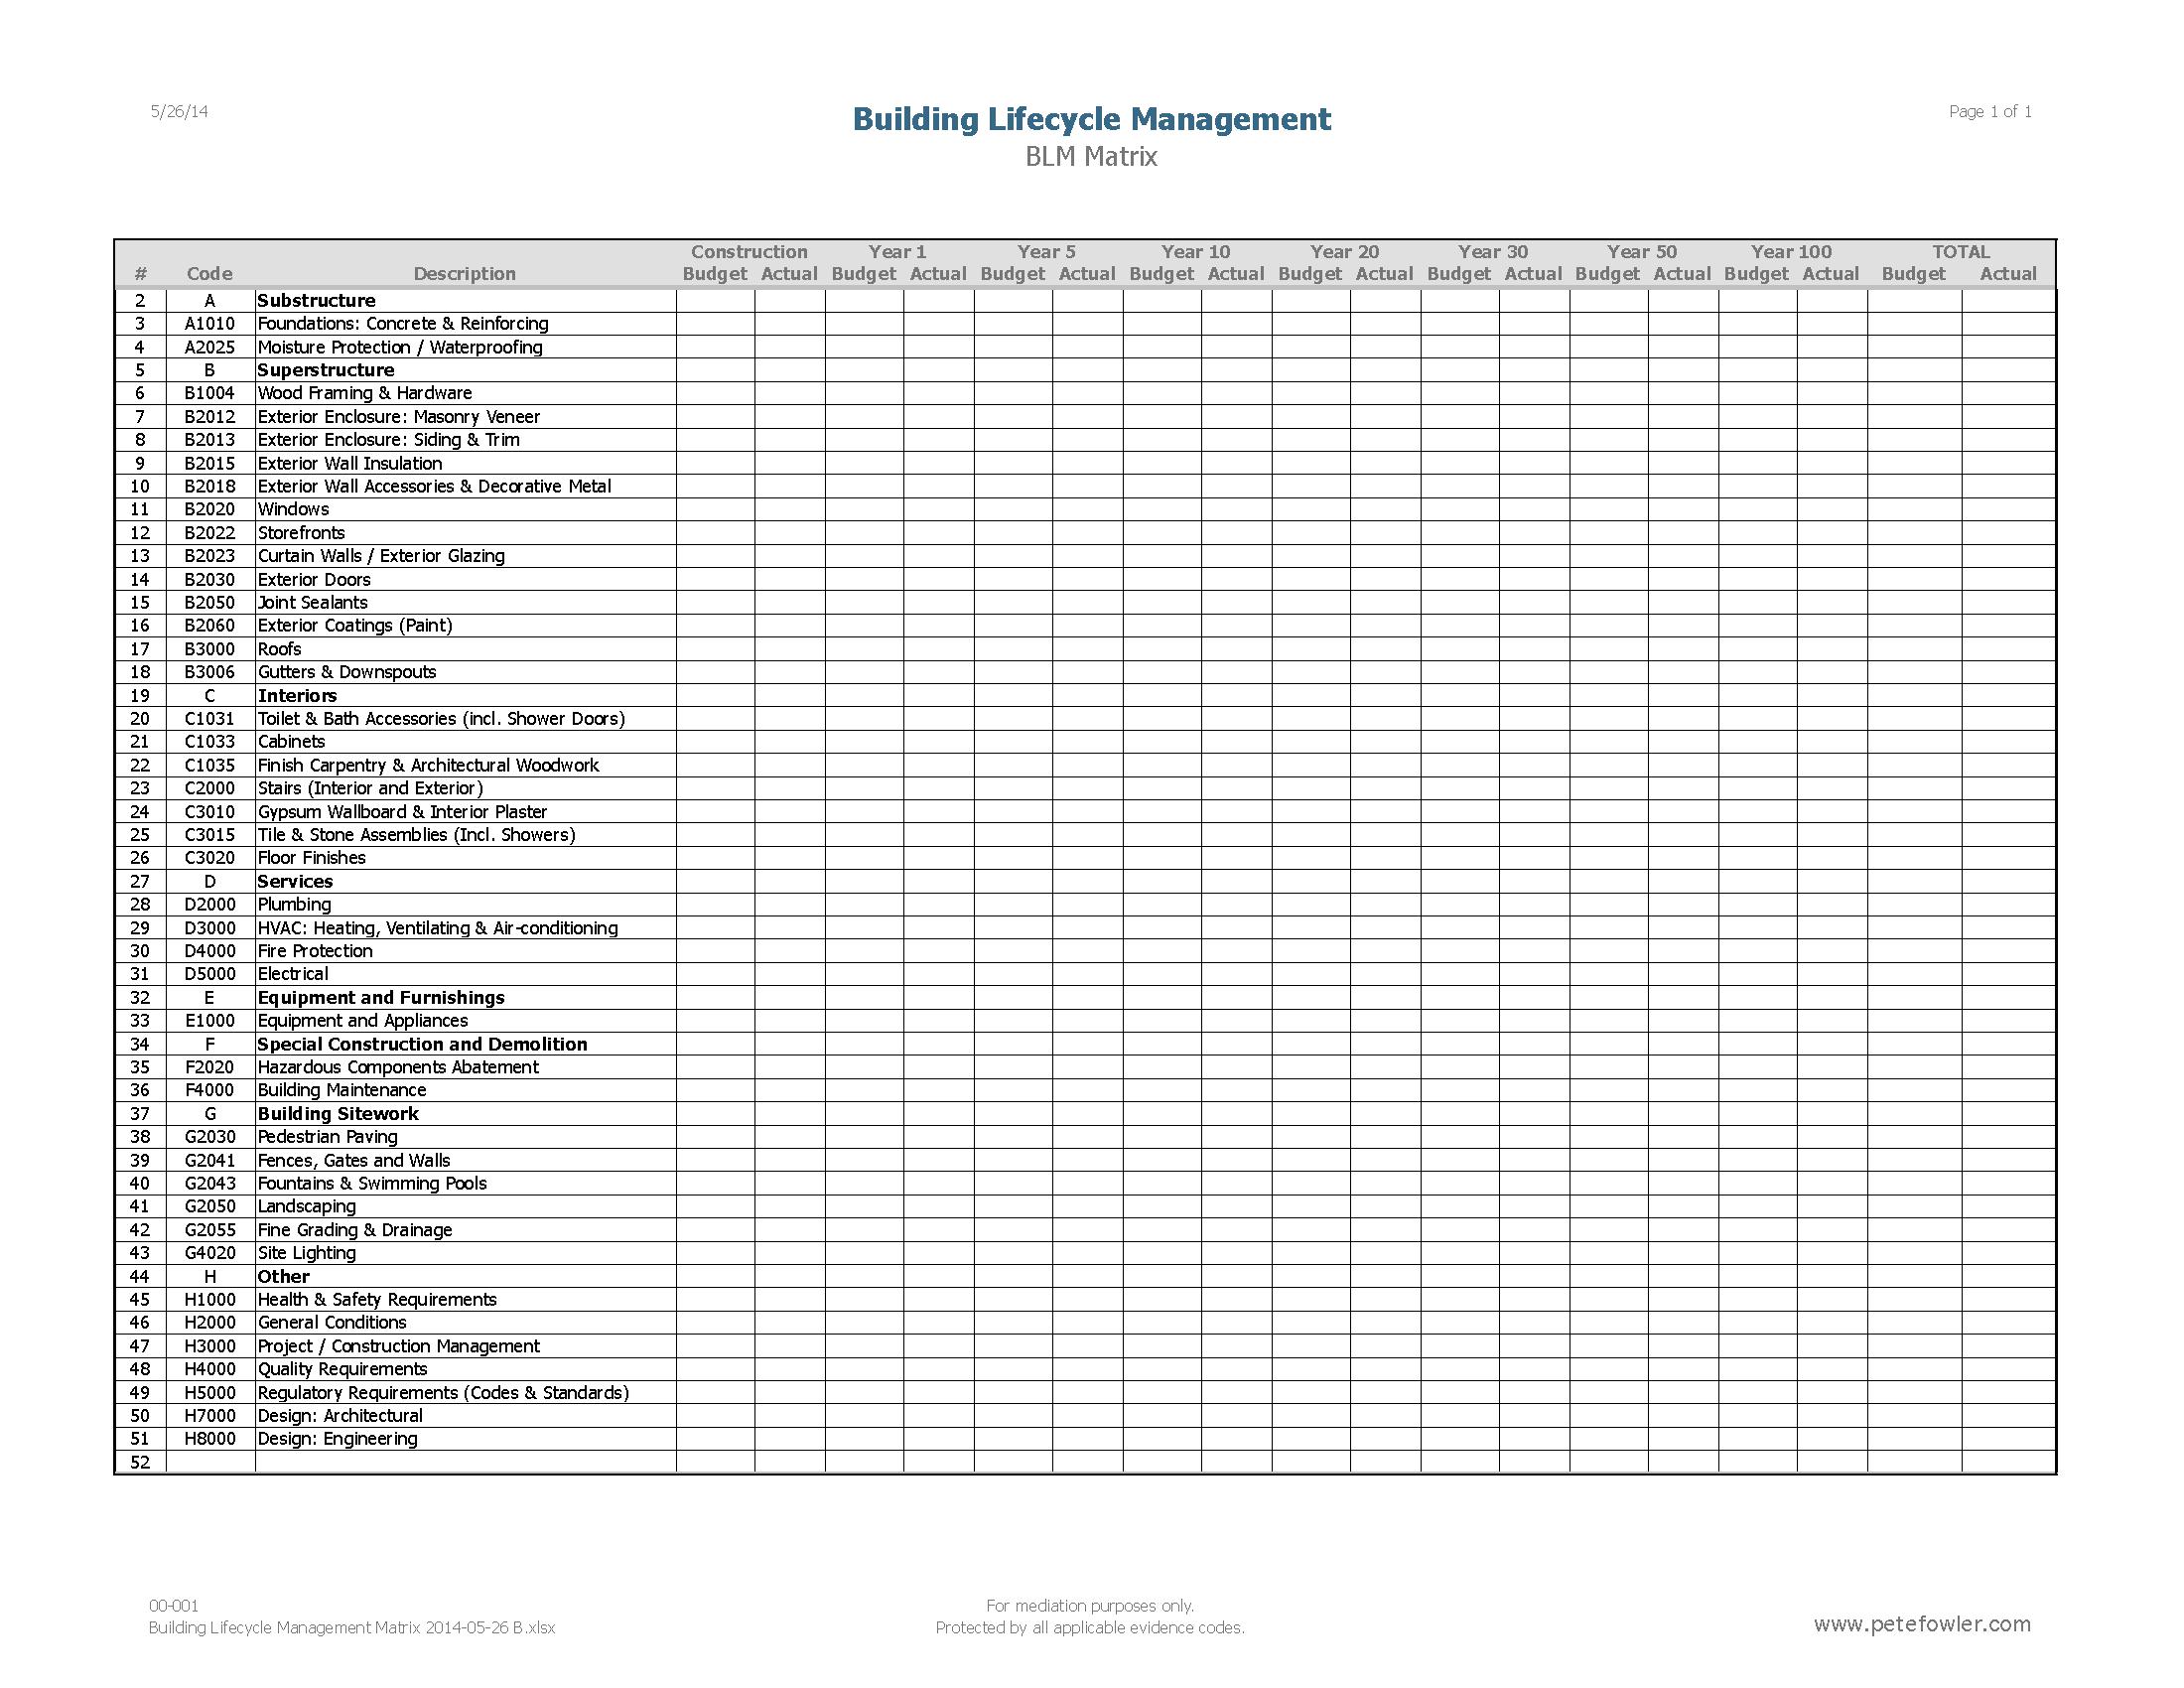 PFCS Building Lifecycle Maintenance Matrix (BLMX